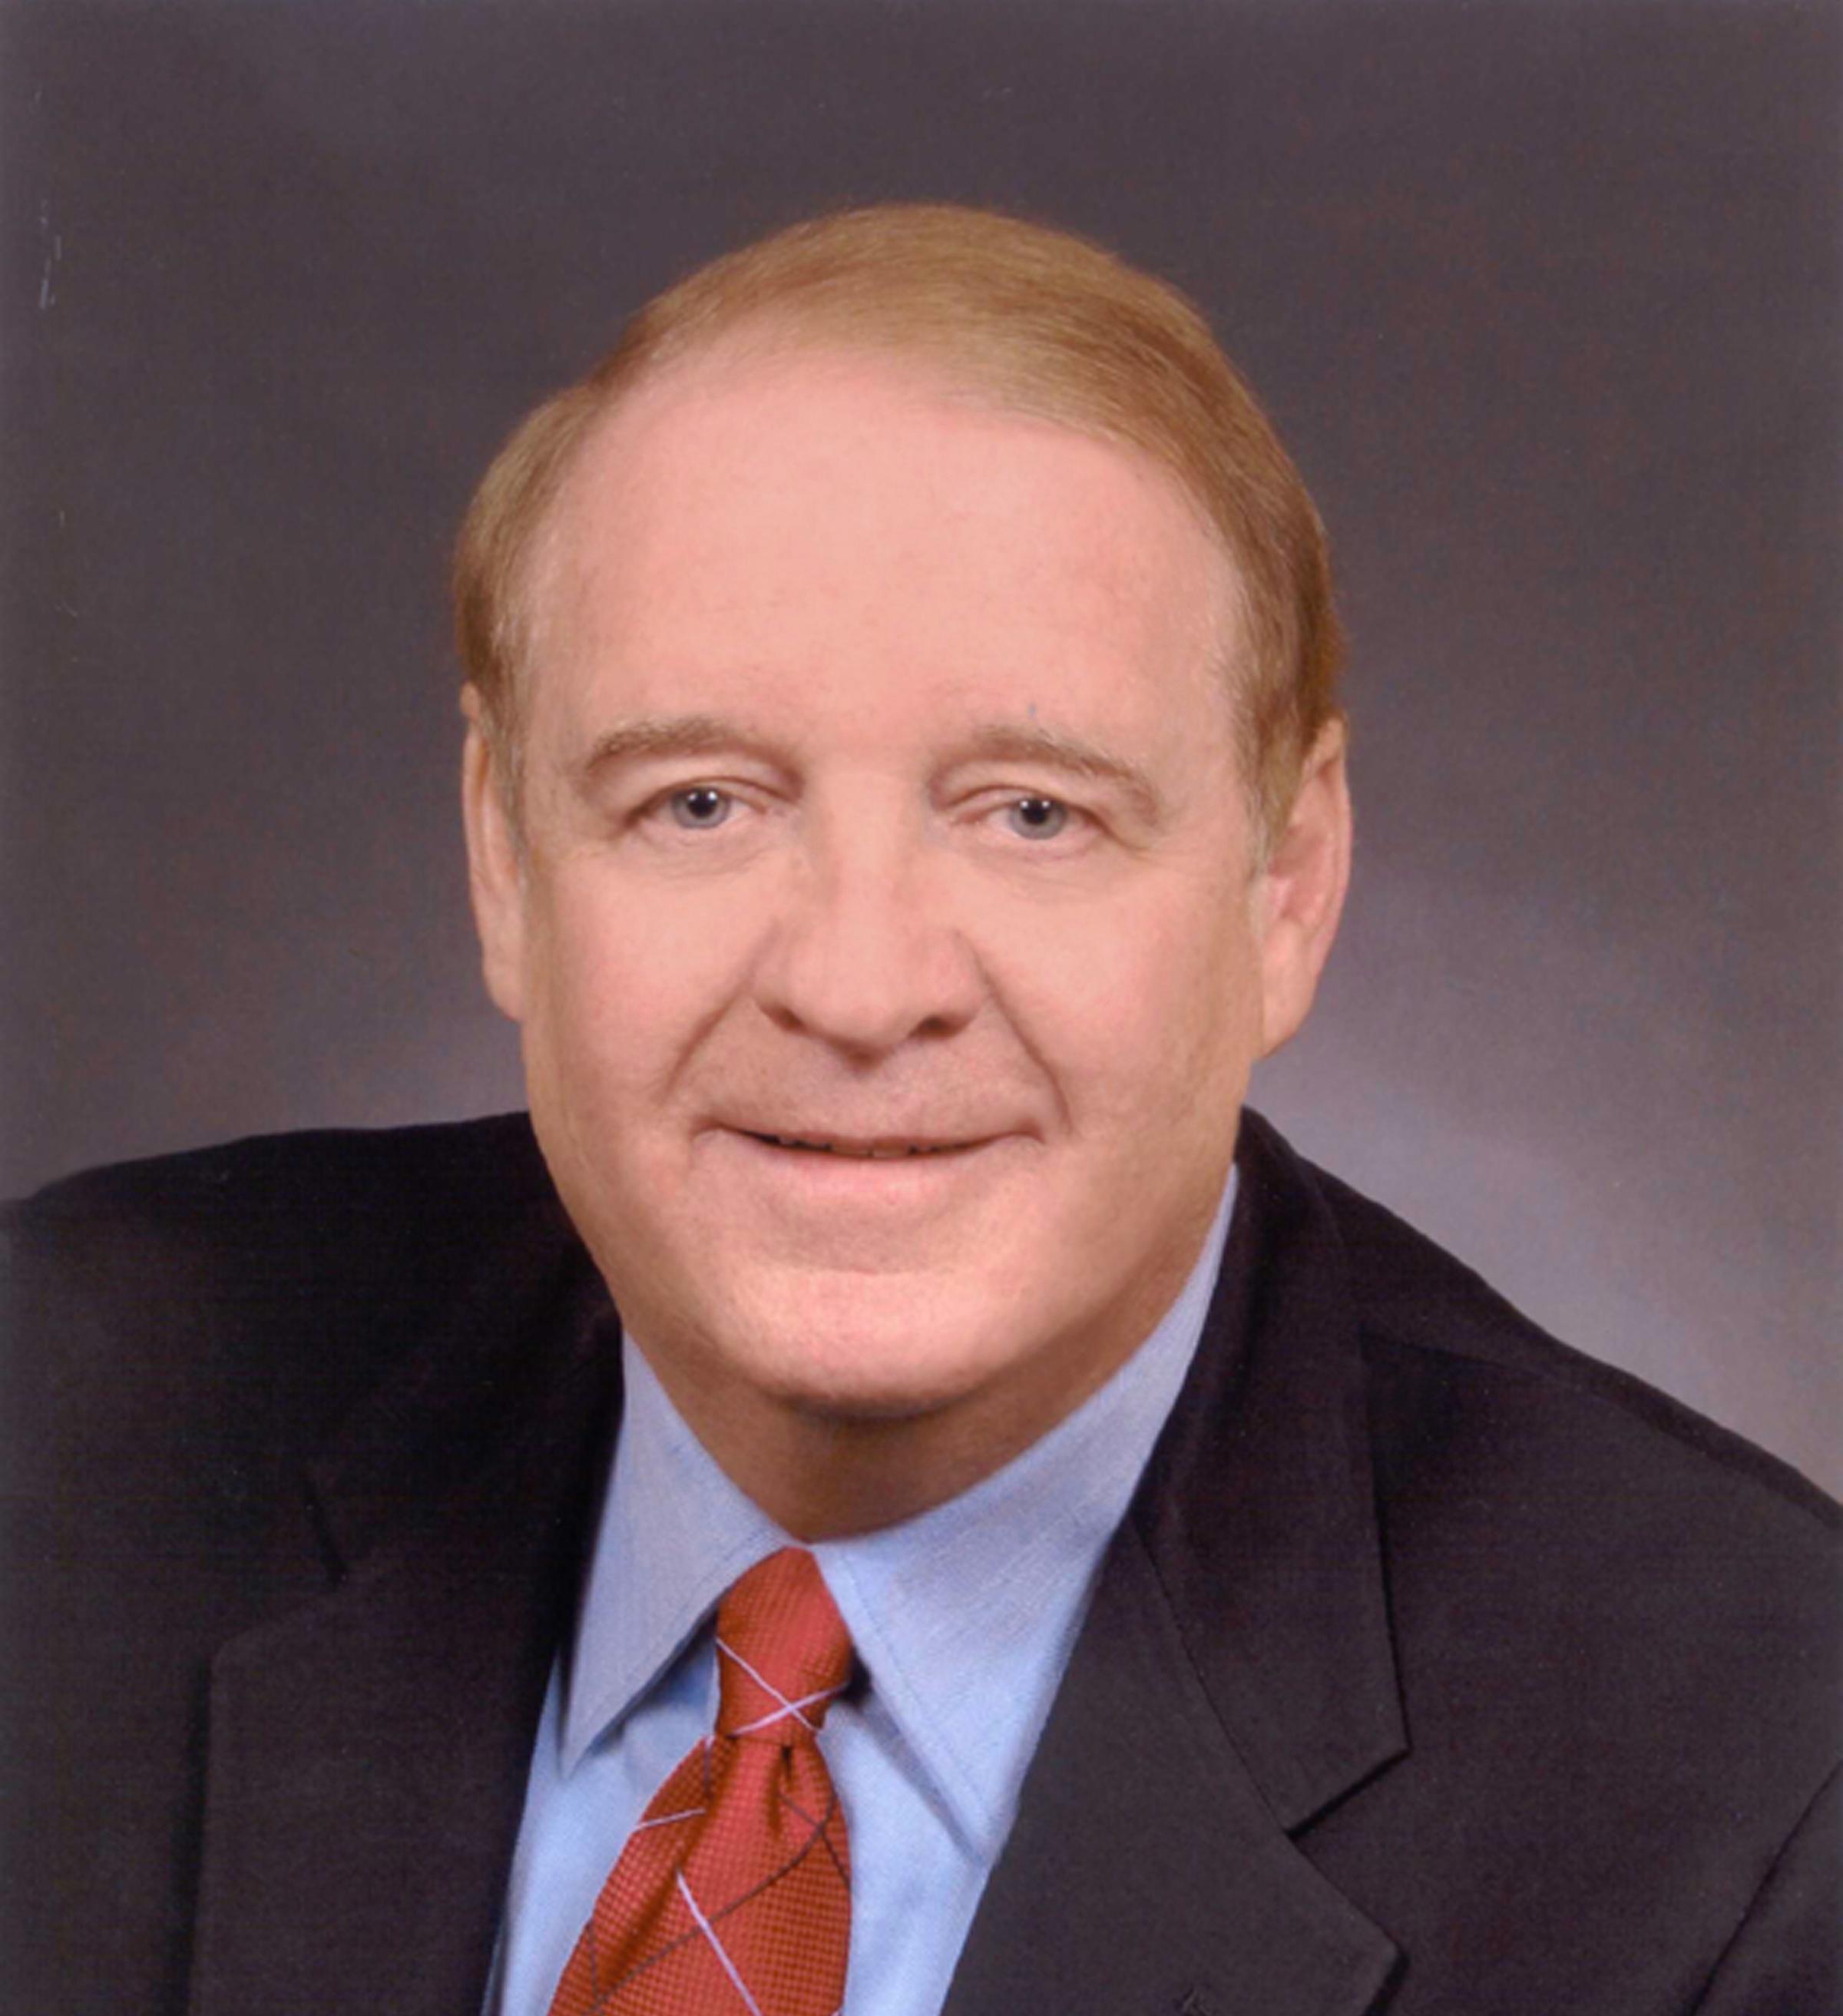 Governor Richard J. Codey